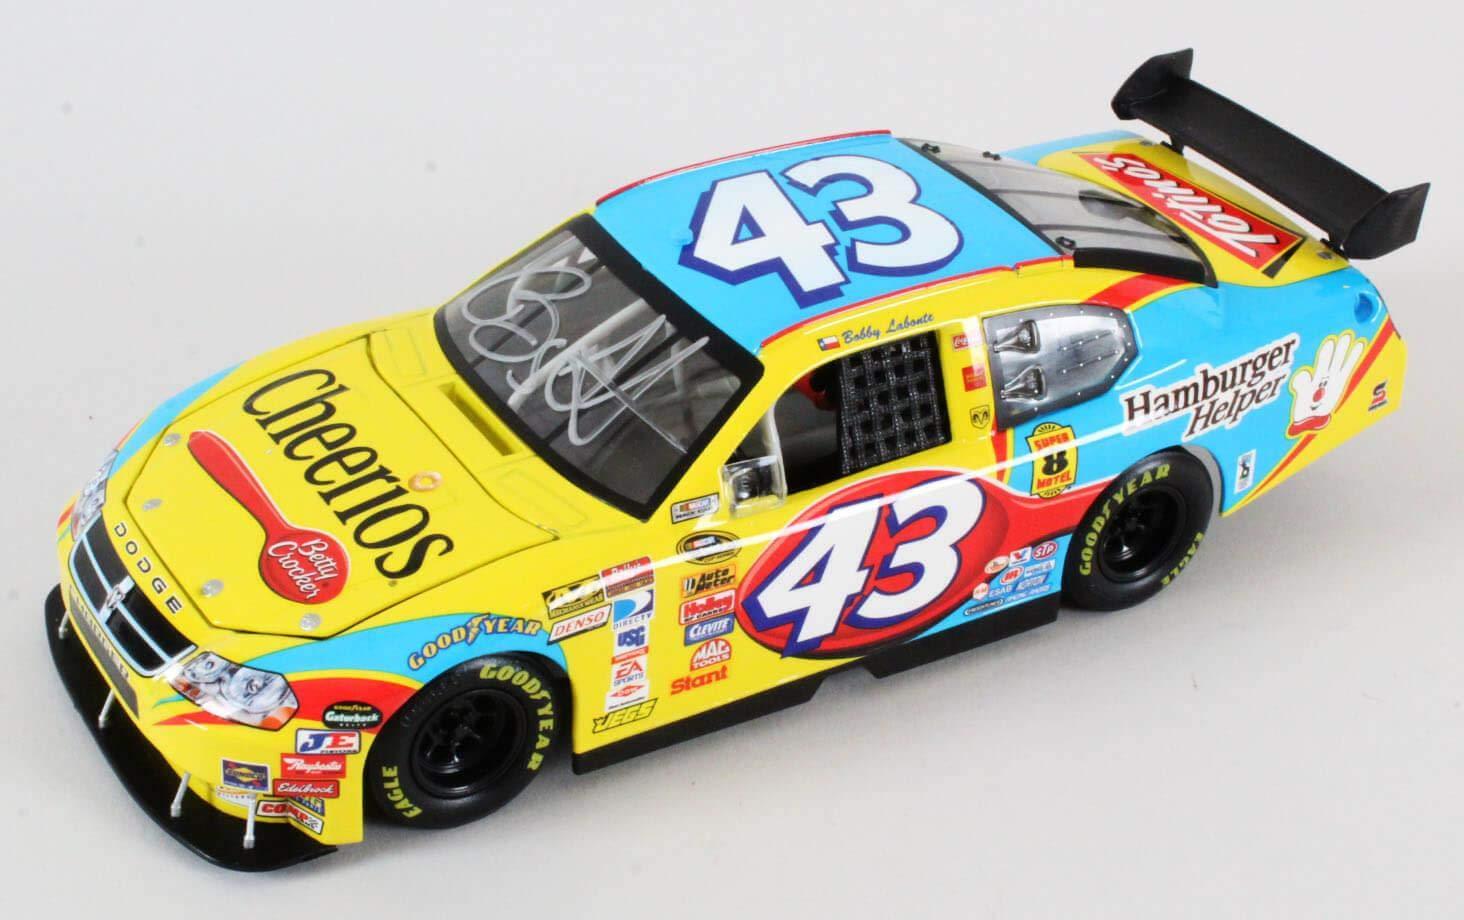 Bobby Labonte Signed Die Cast Car NASCAR COA JSA Certified Autographed Diecast Cars